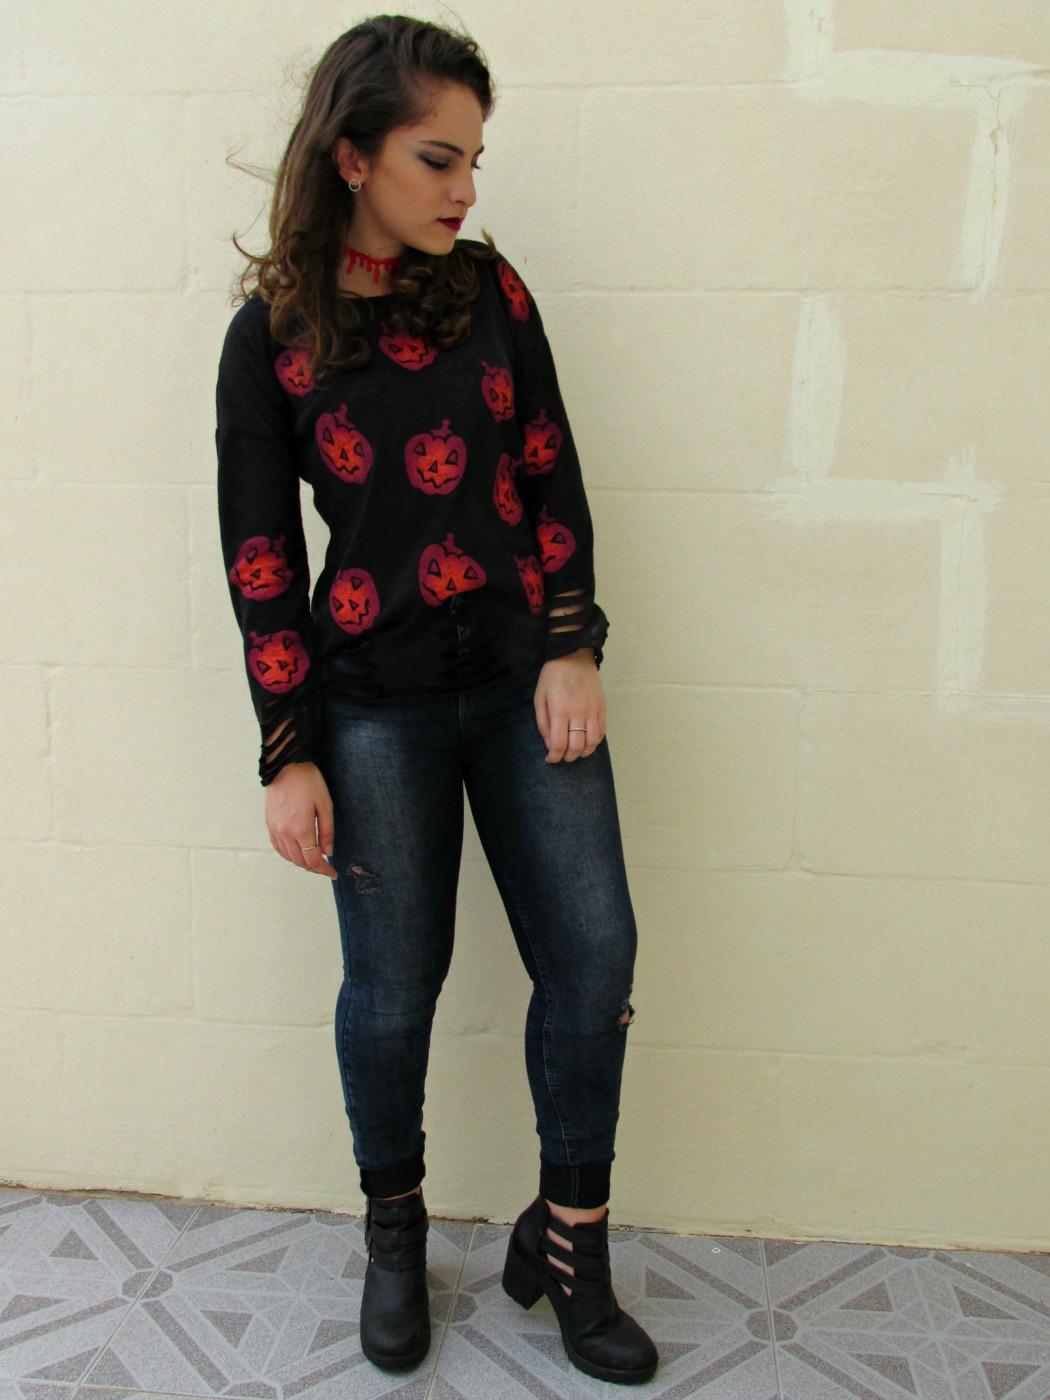 Halloween outfit with Rosegal, blood choker, pumpkin sweater, Rosegal review